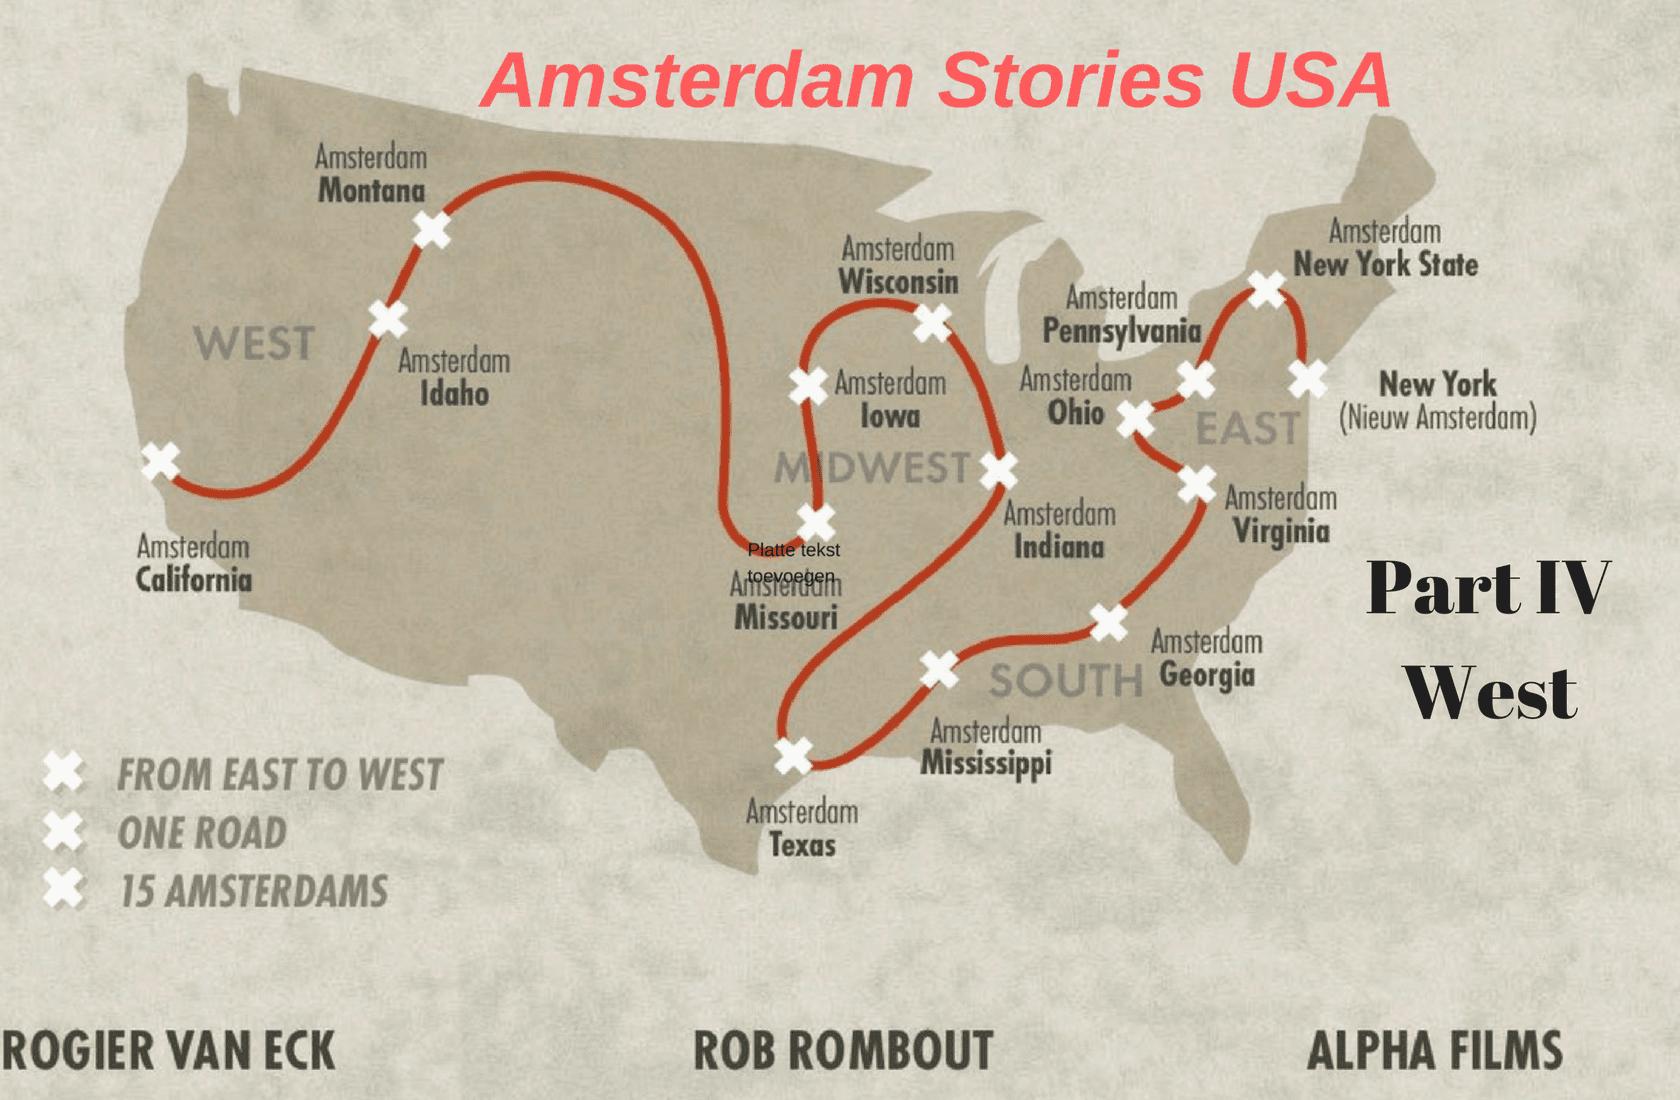 Amsterdam Stories USA IV